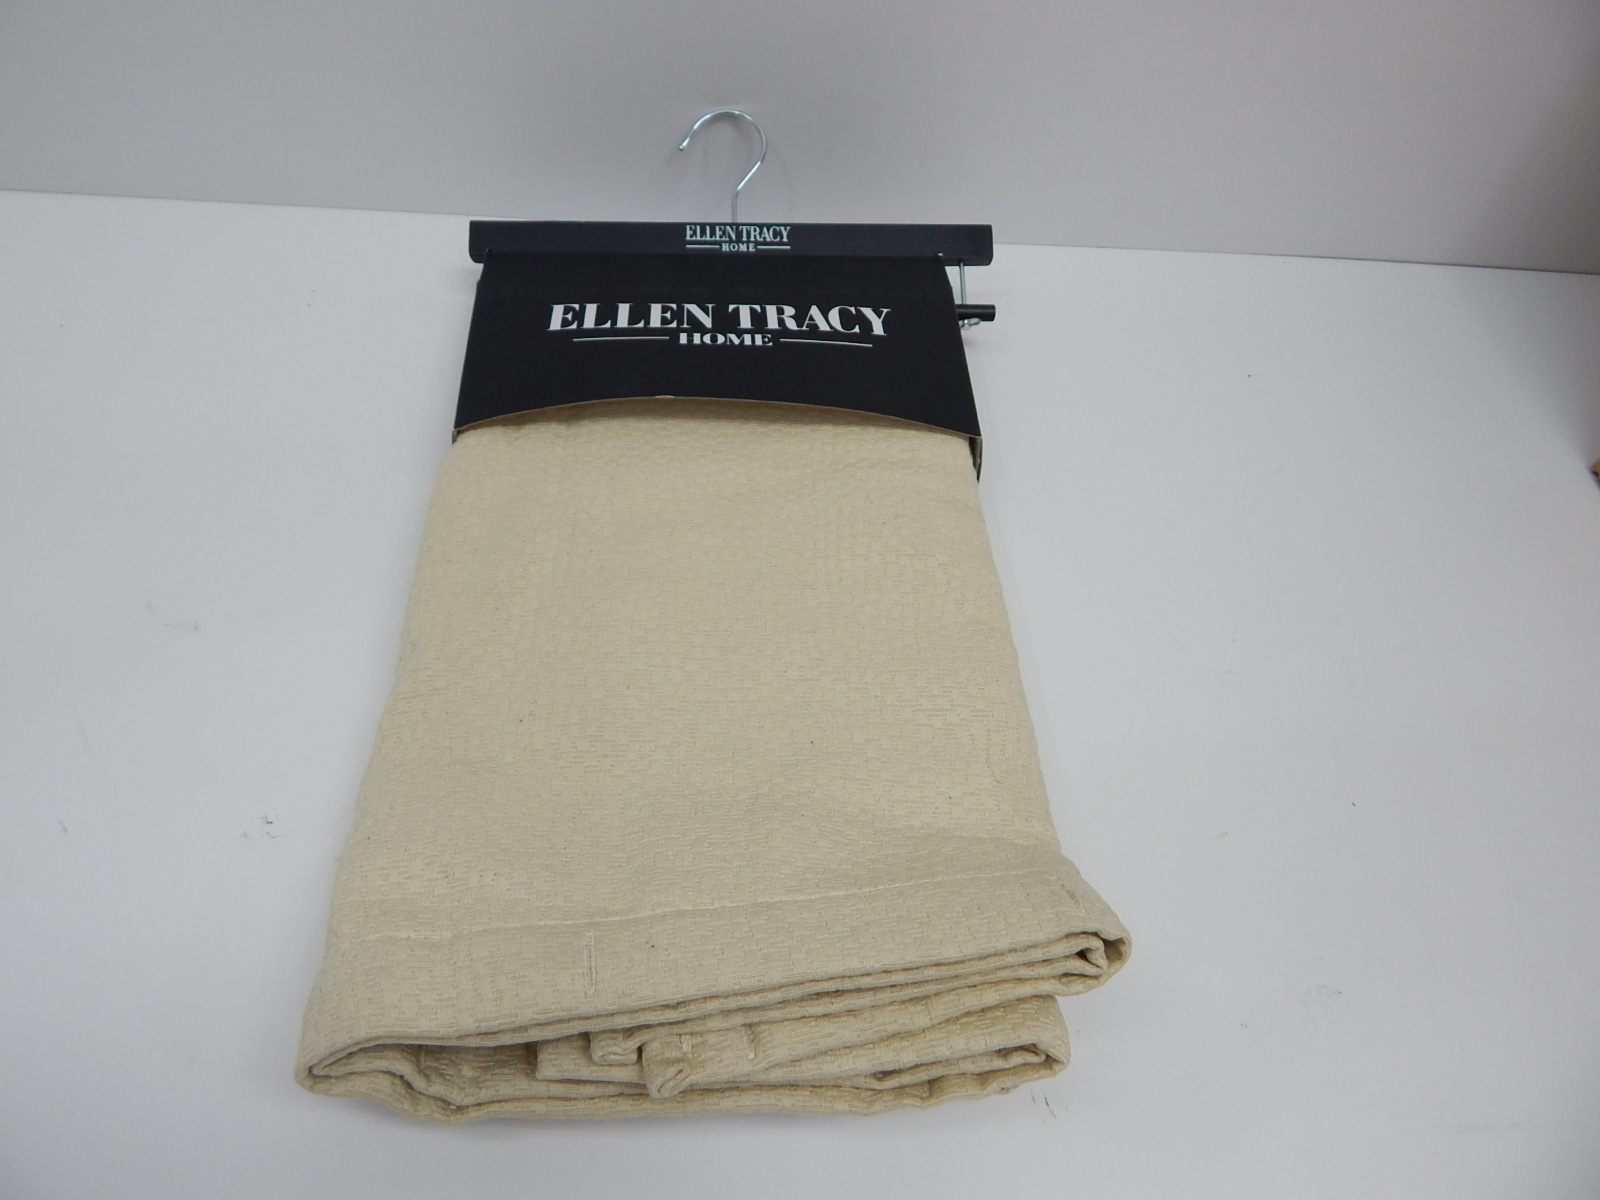 Dainty Home Ellen Tracy Cotton Blend Fieldstone Shower Curtain 72x72 Ivory